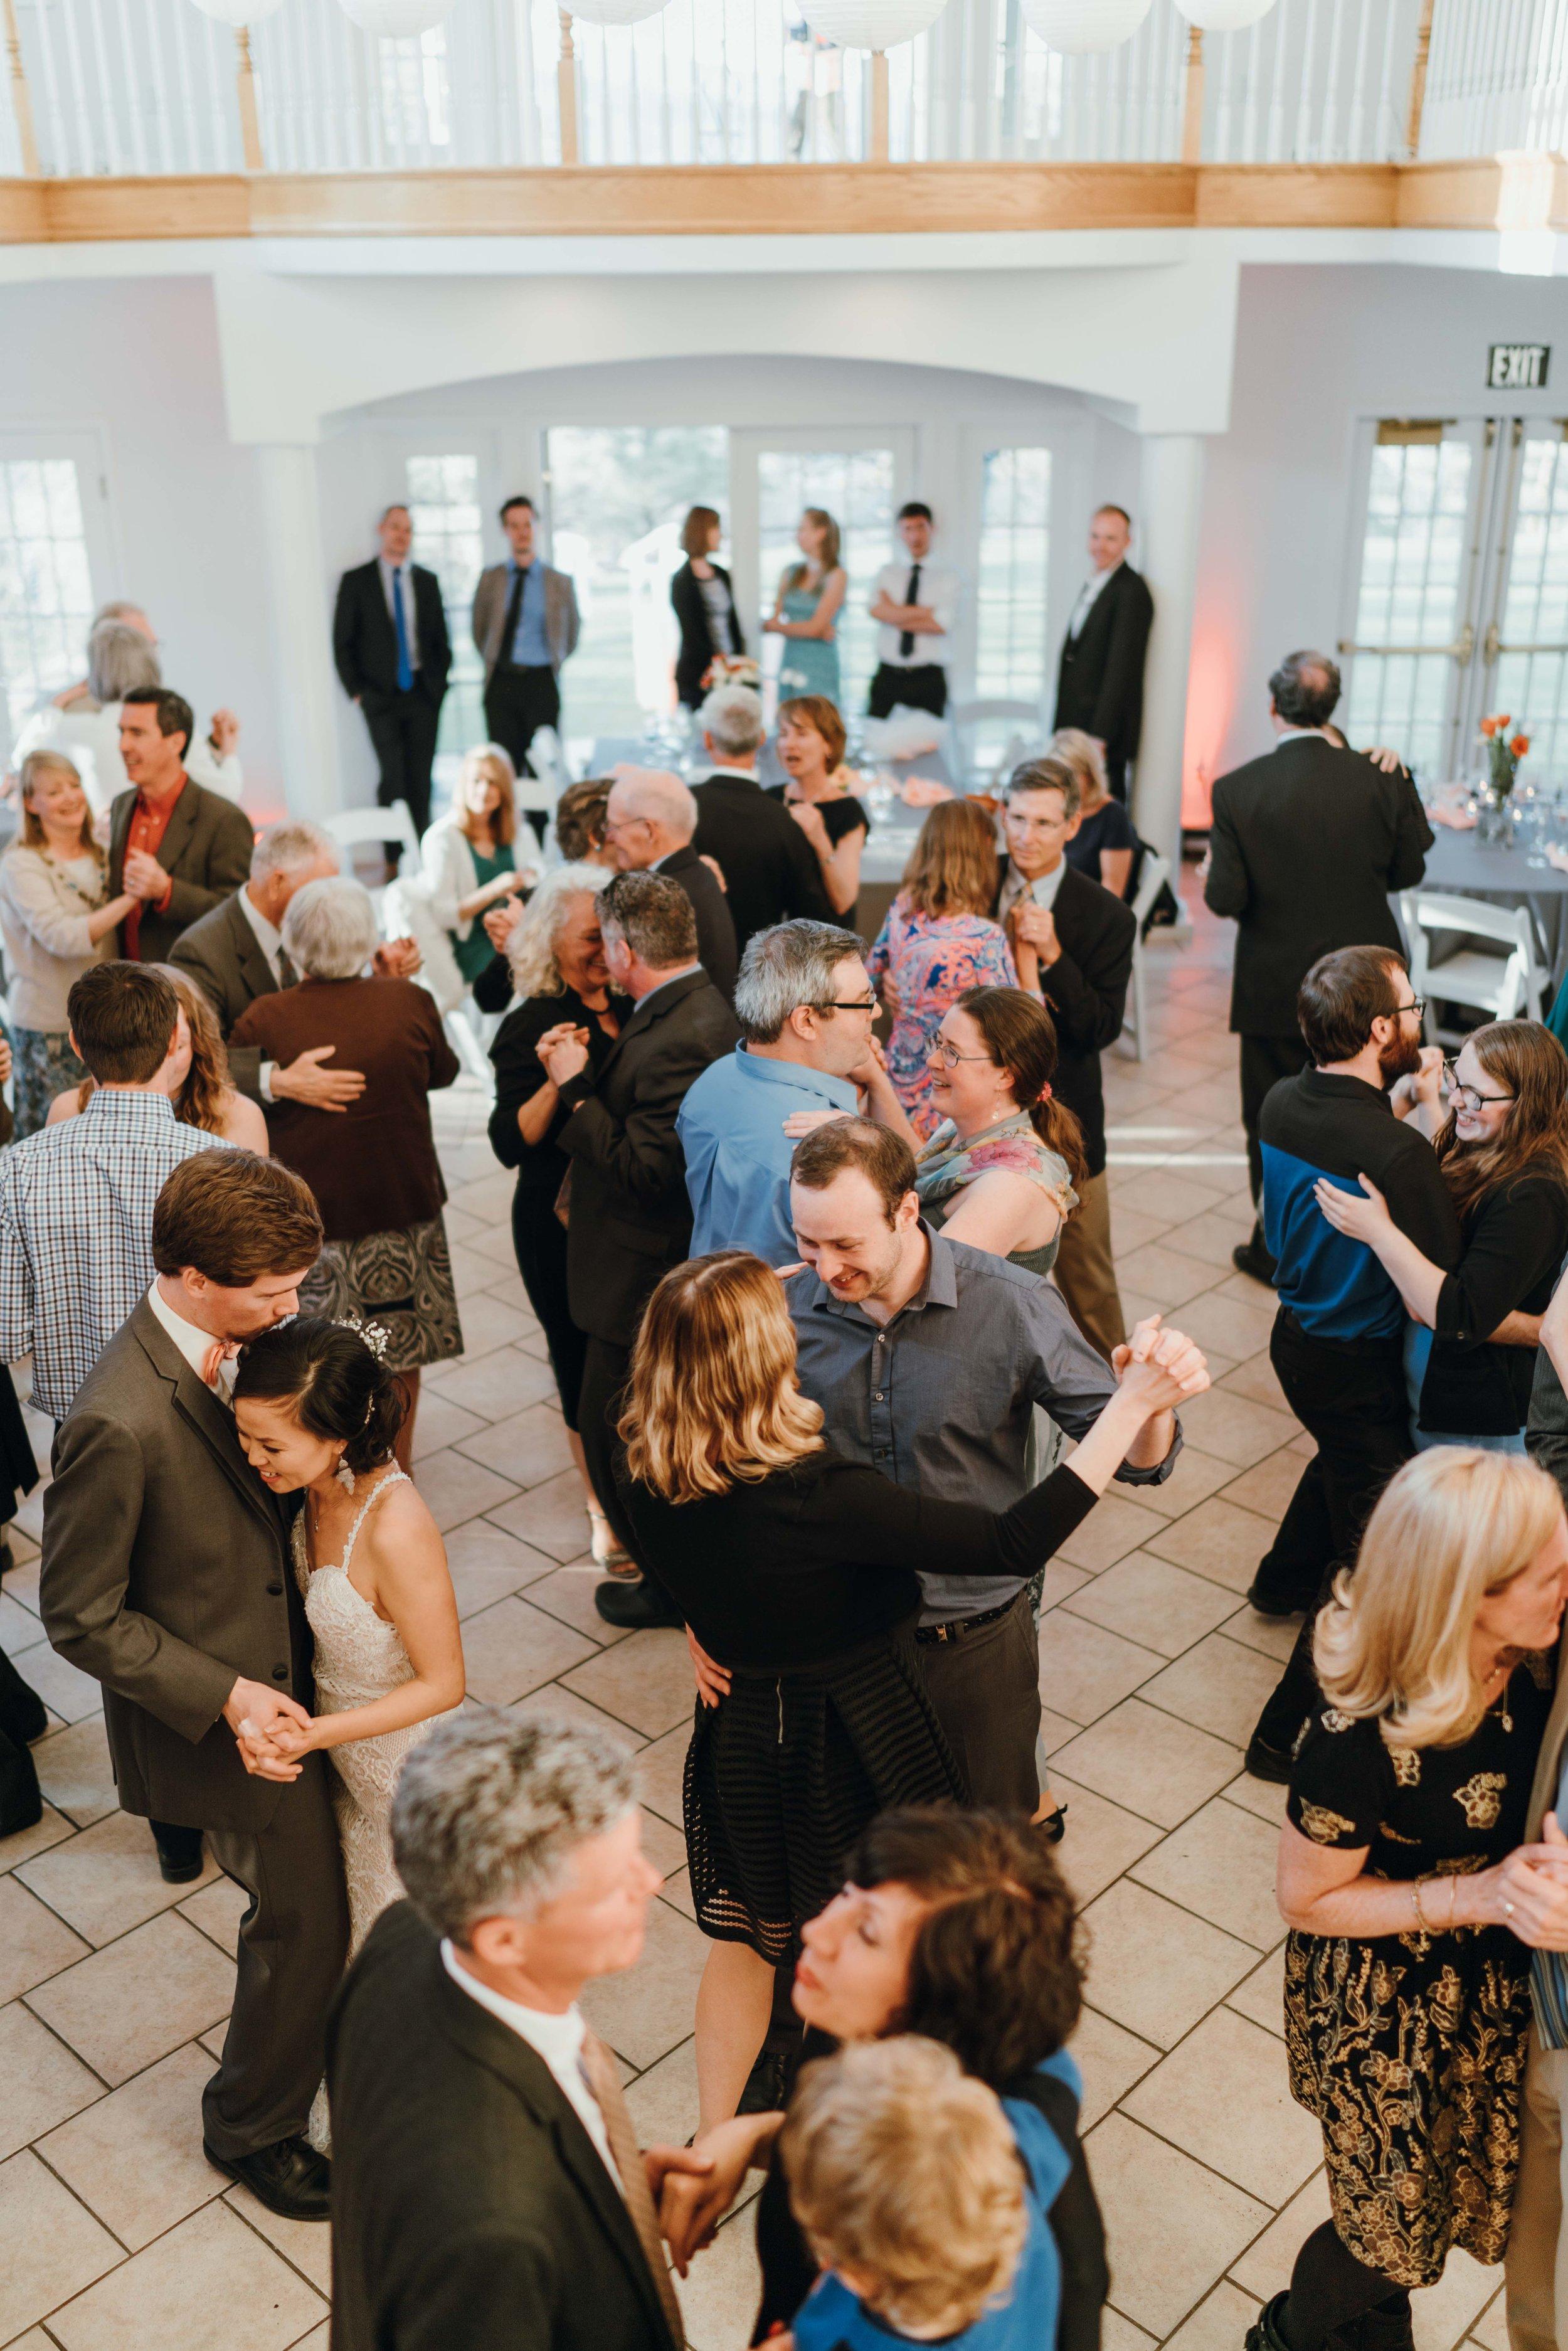 denver wedding photographer lioncrest manor in lyons ben and mali -DSC06613.jpg